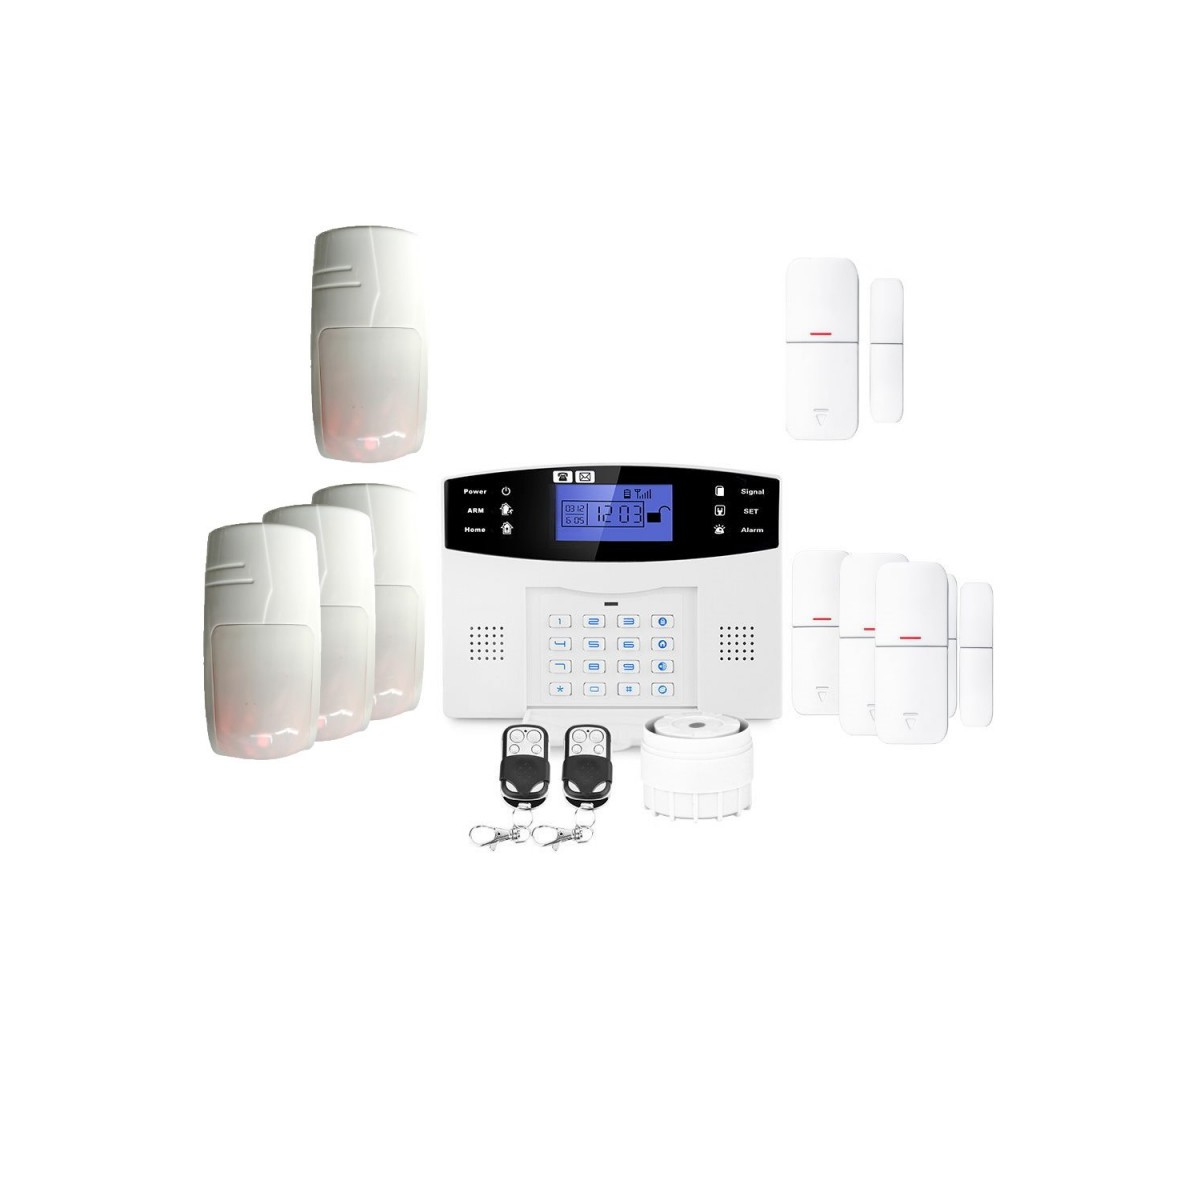 Alarme grande maison sans fil gsm lifebox evolution animal kit-8